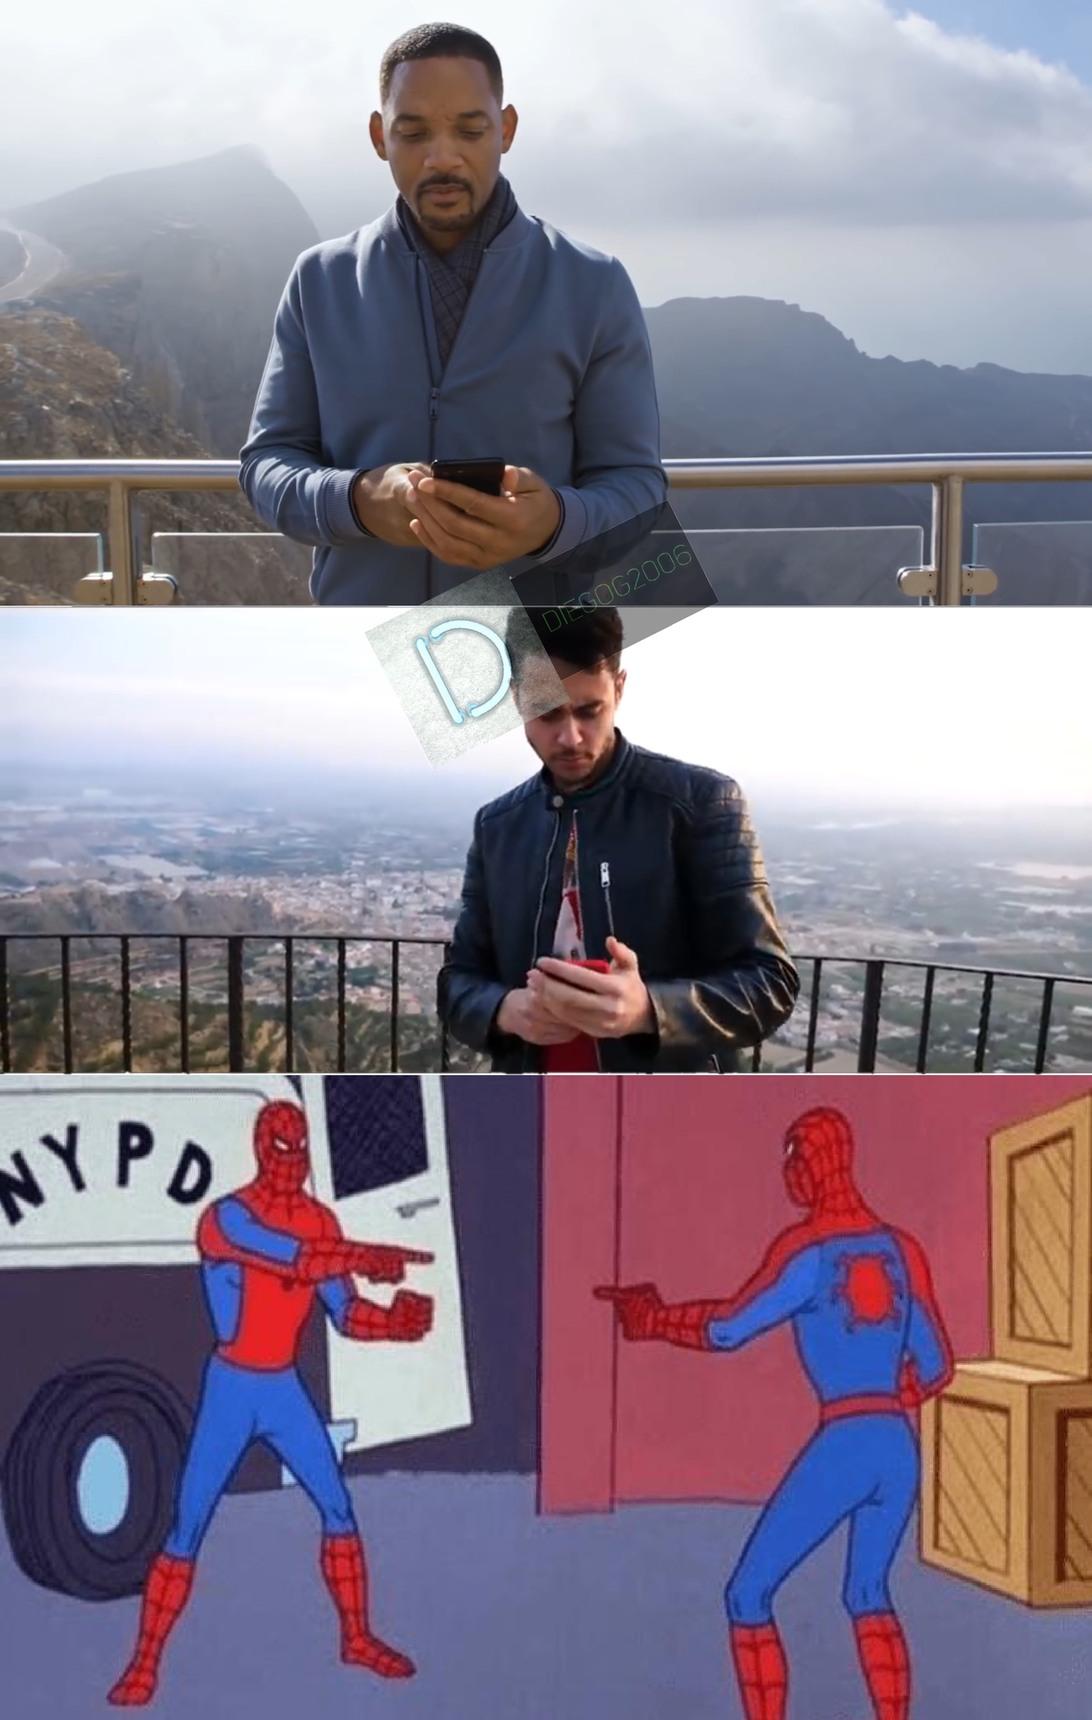 plantilla gratis papus - meme